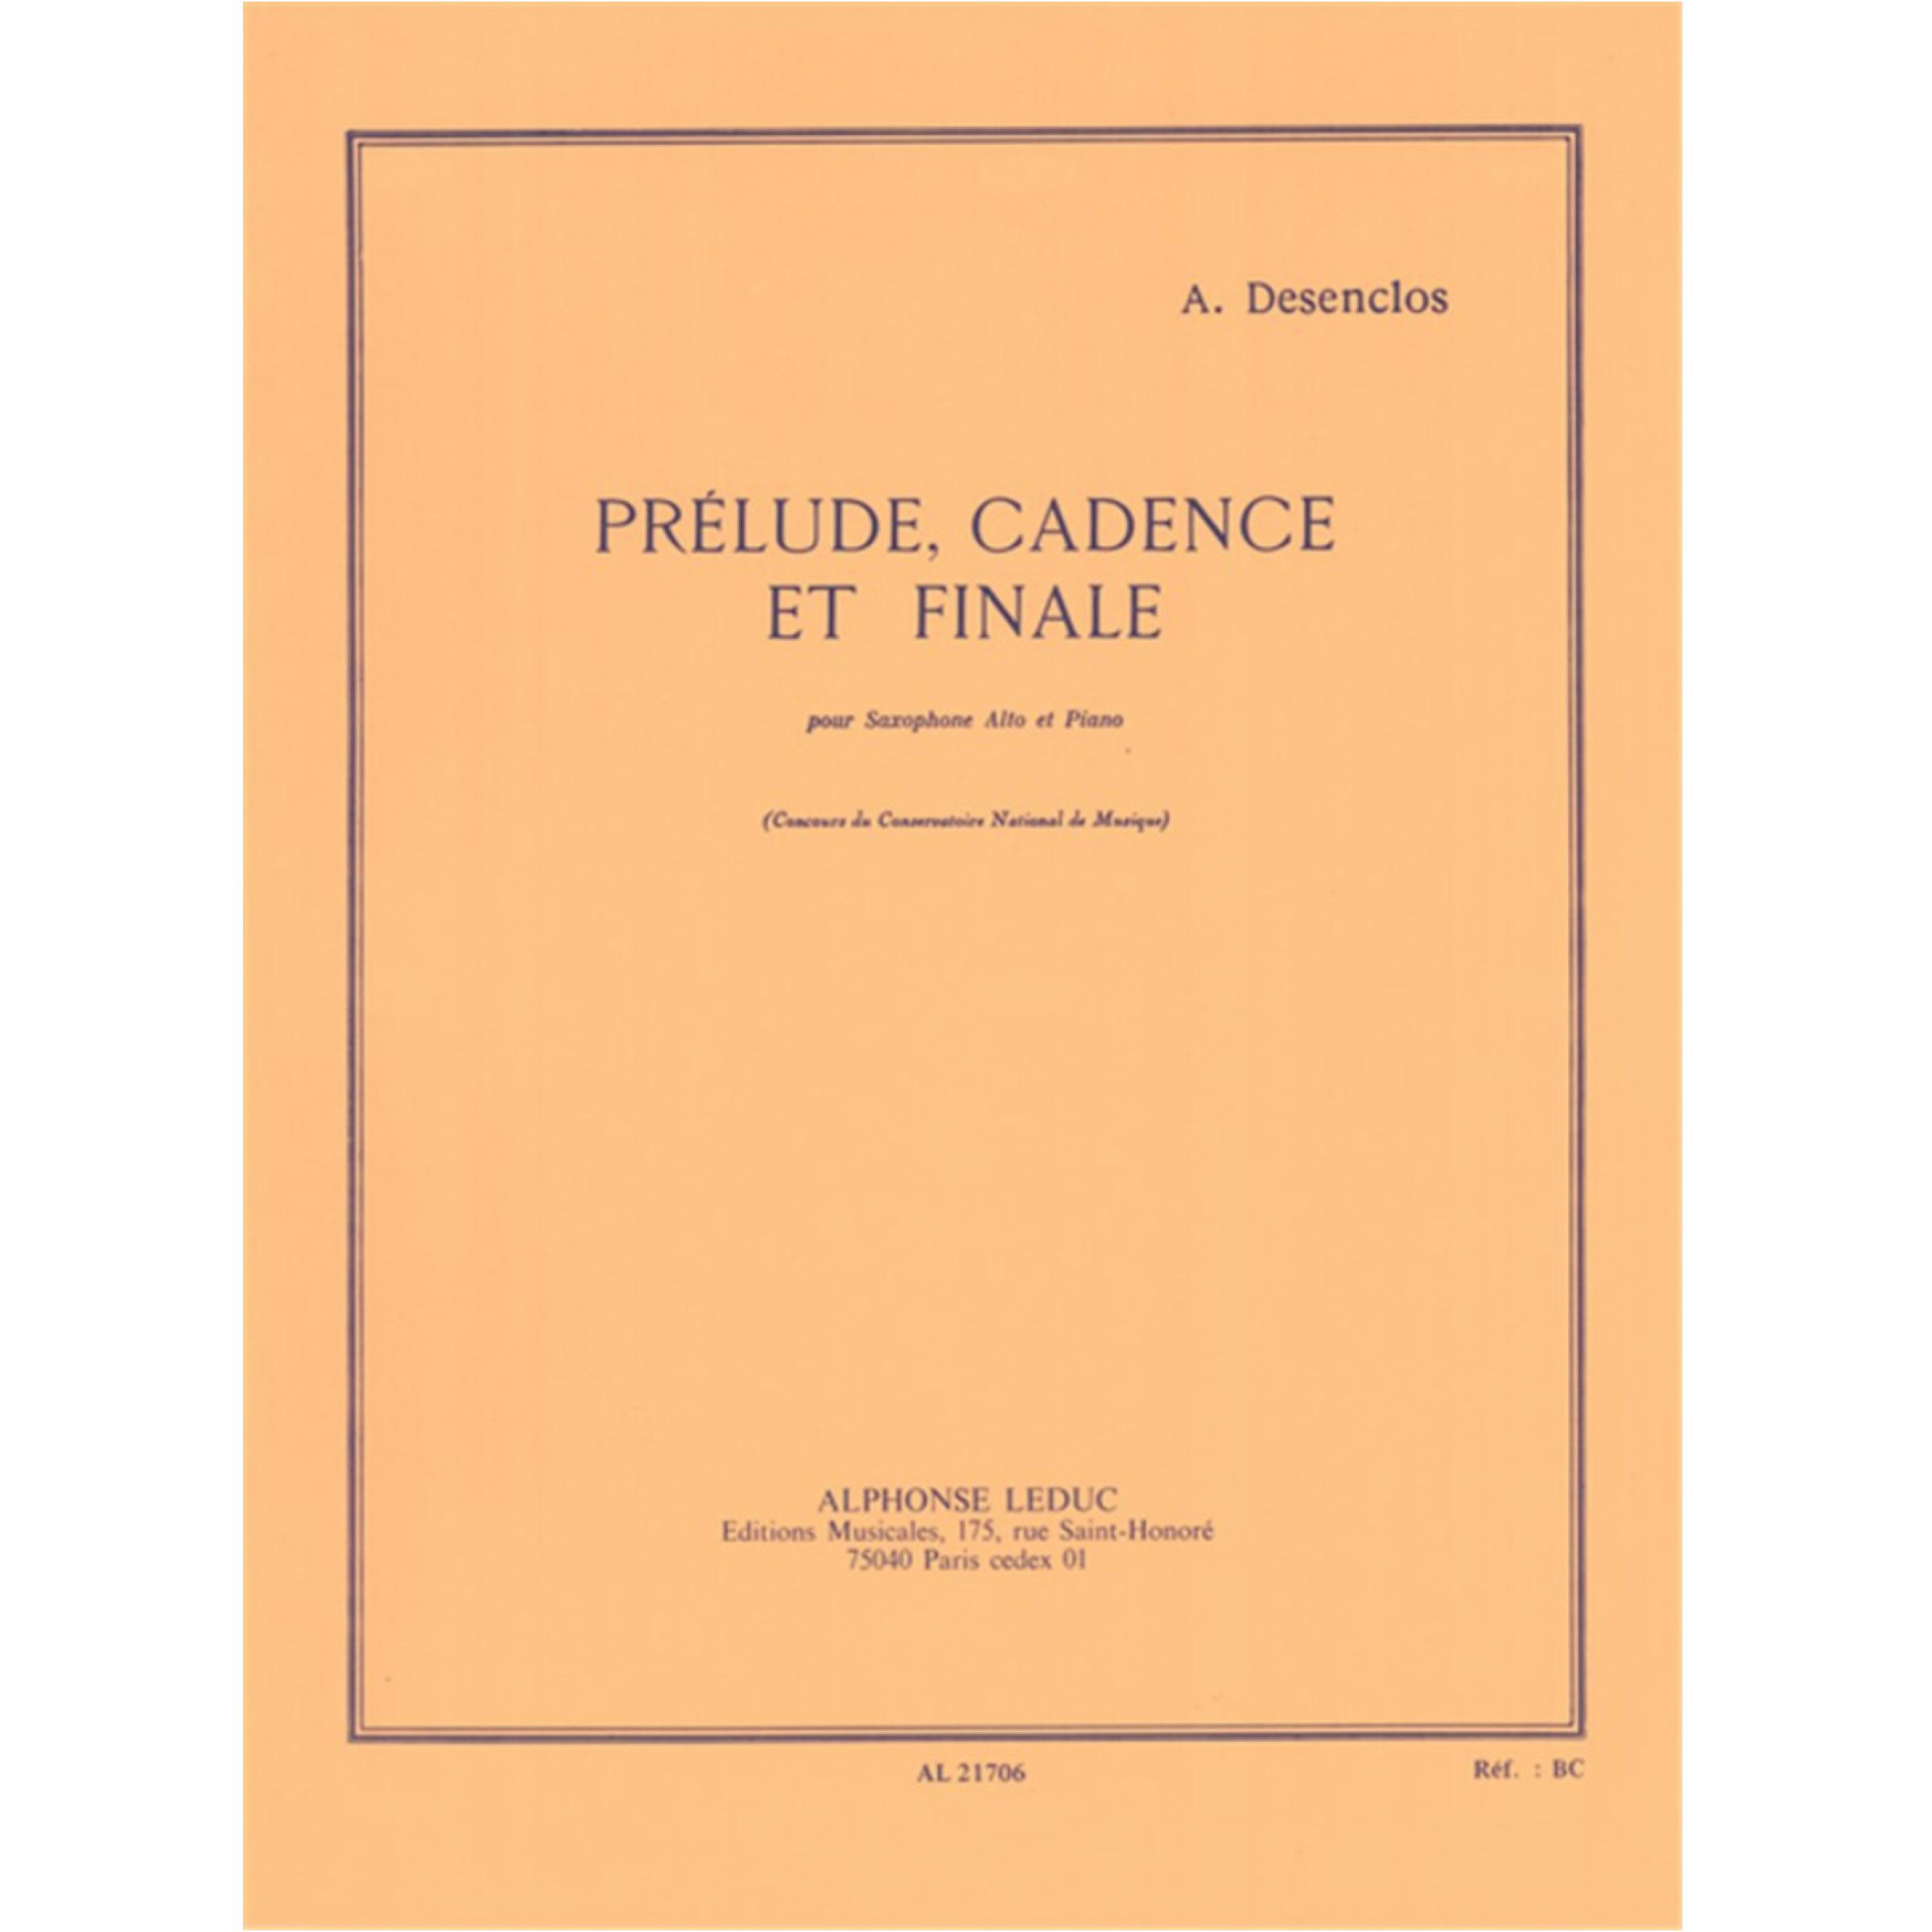 Prelude Cadence et Finale altsax & piano